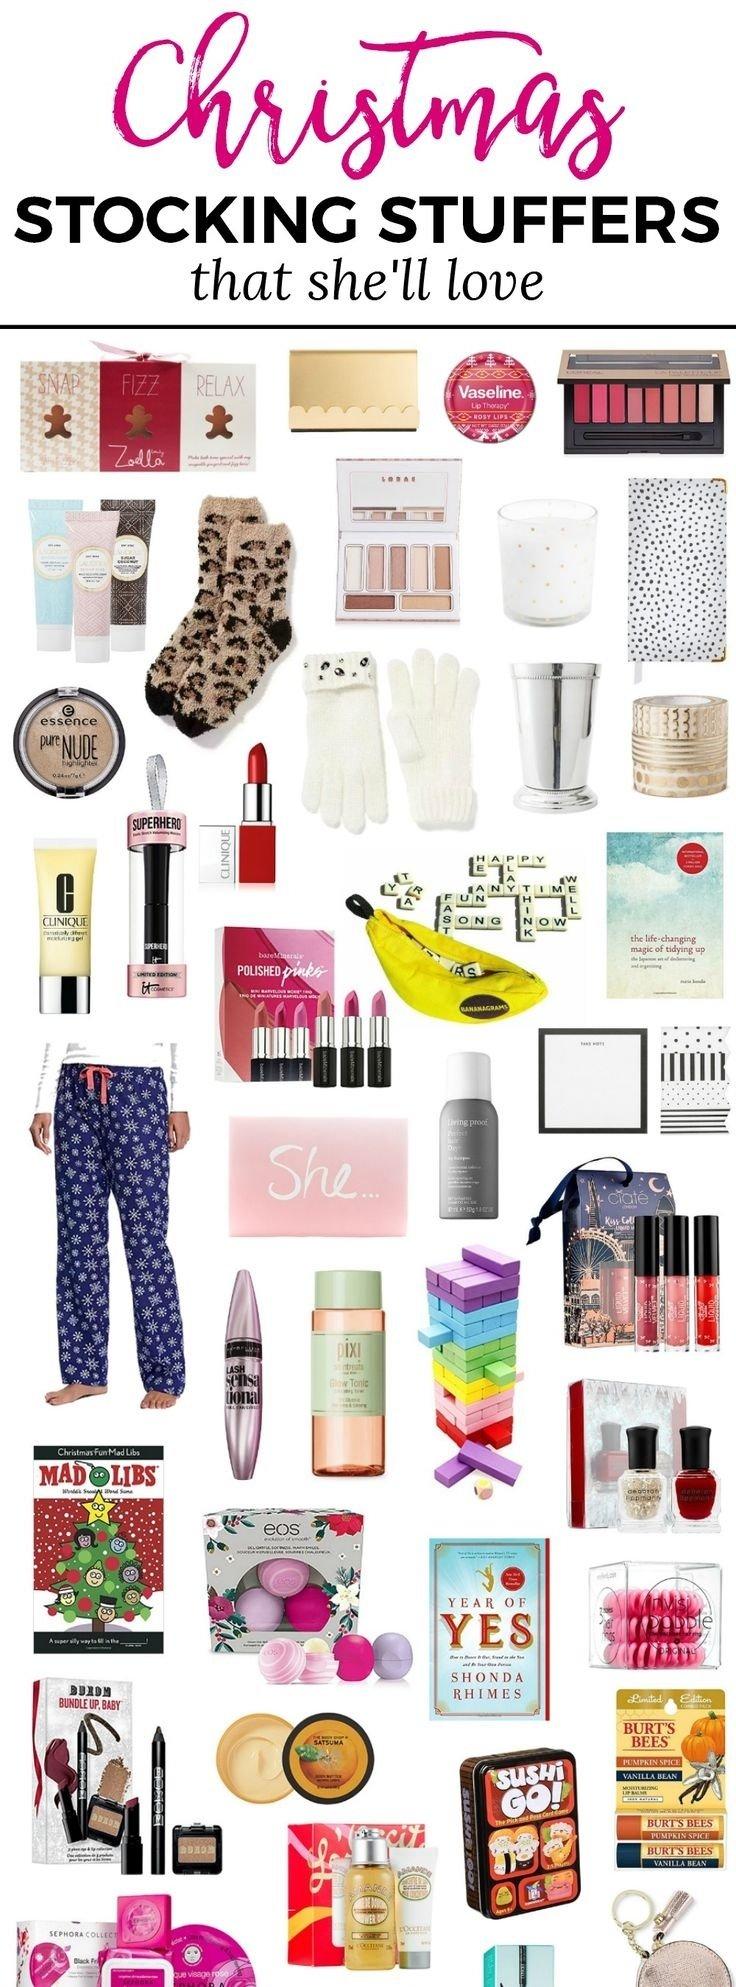 10 Stunning Cool Gift Ideas For Women 366 best stocking stuffers images on pinterest christmas 7 2021